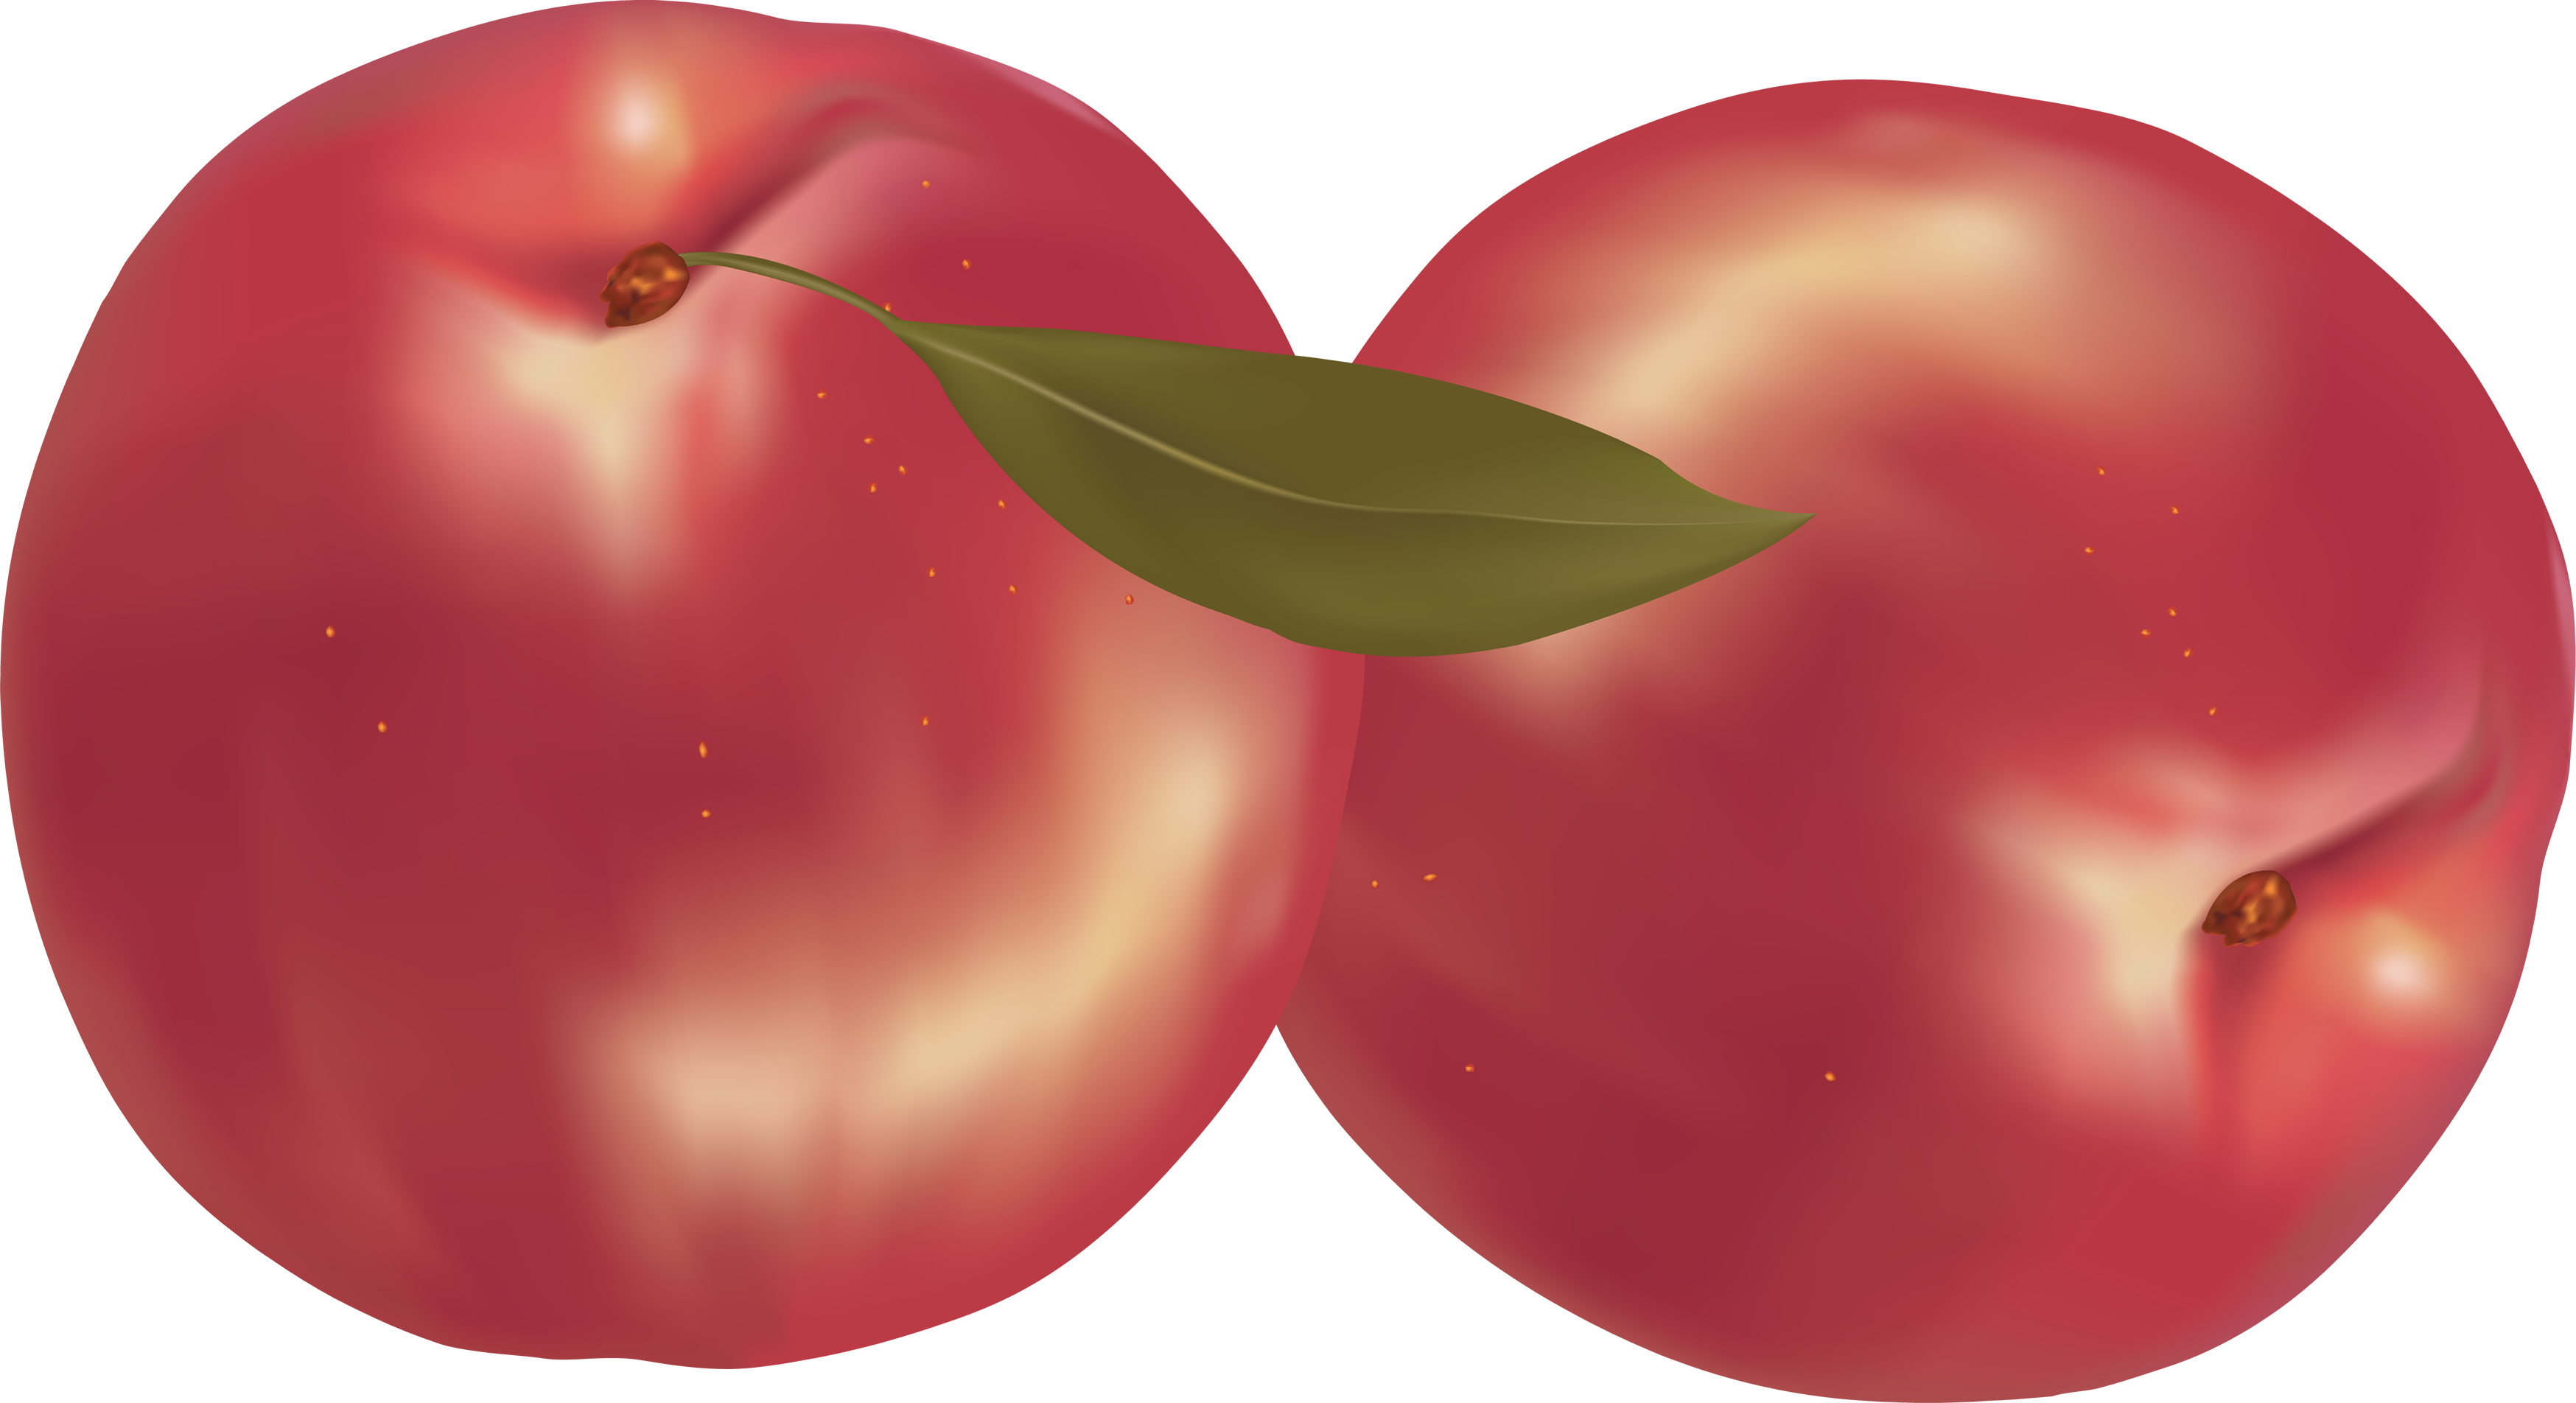 Peach clipart plum Image download peach pictures image